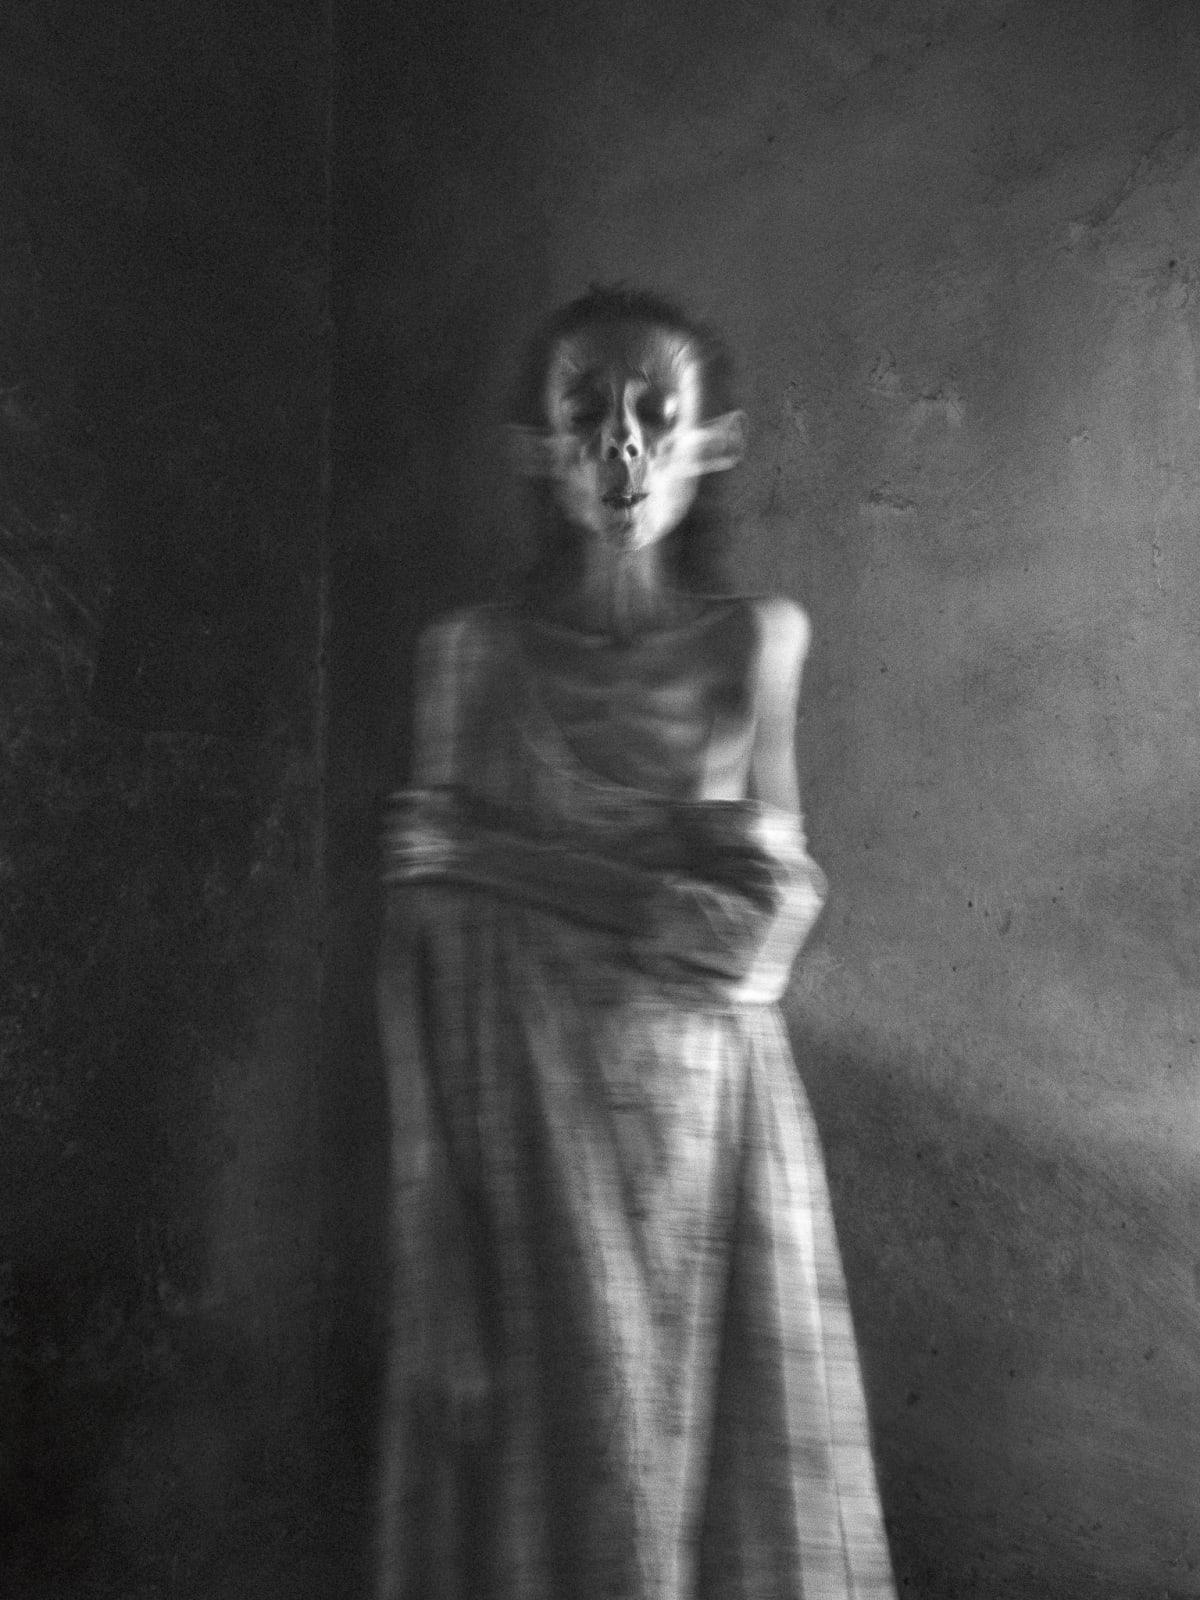 Lene Marie Fossen, Untitled Chios 8091641, 2017